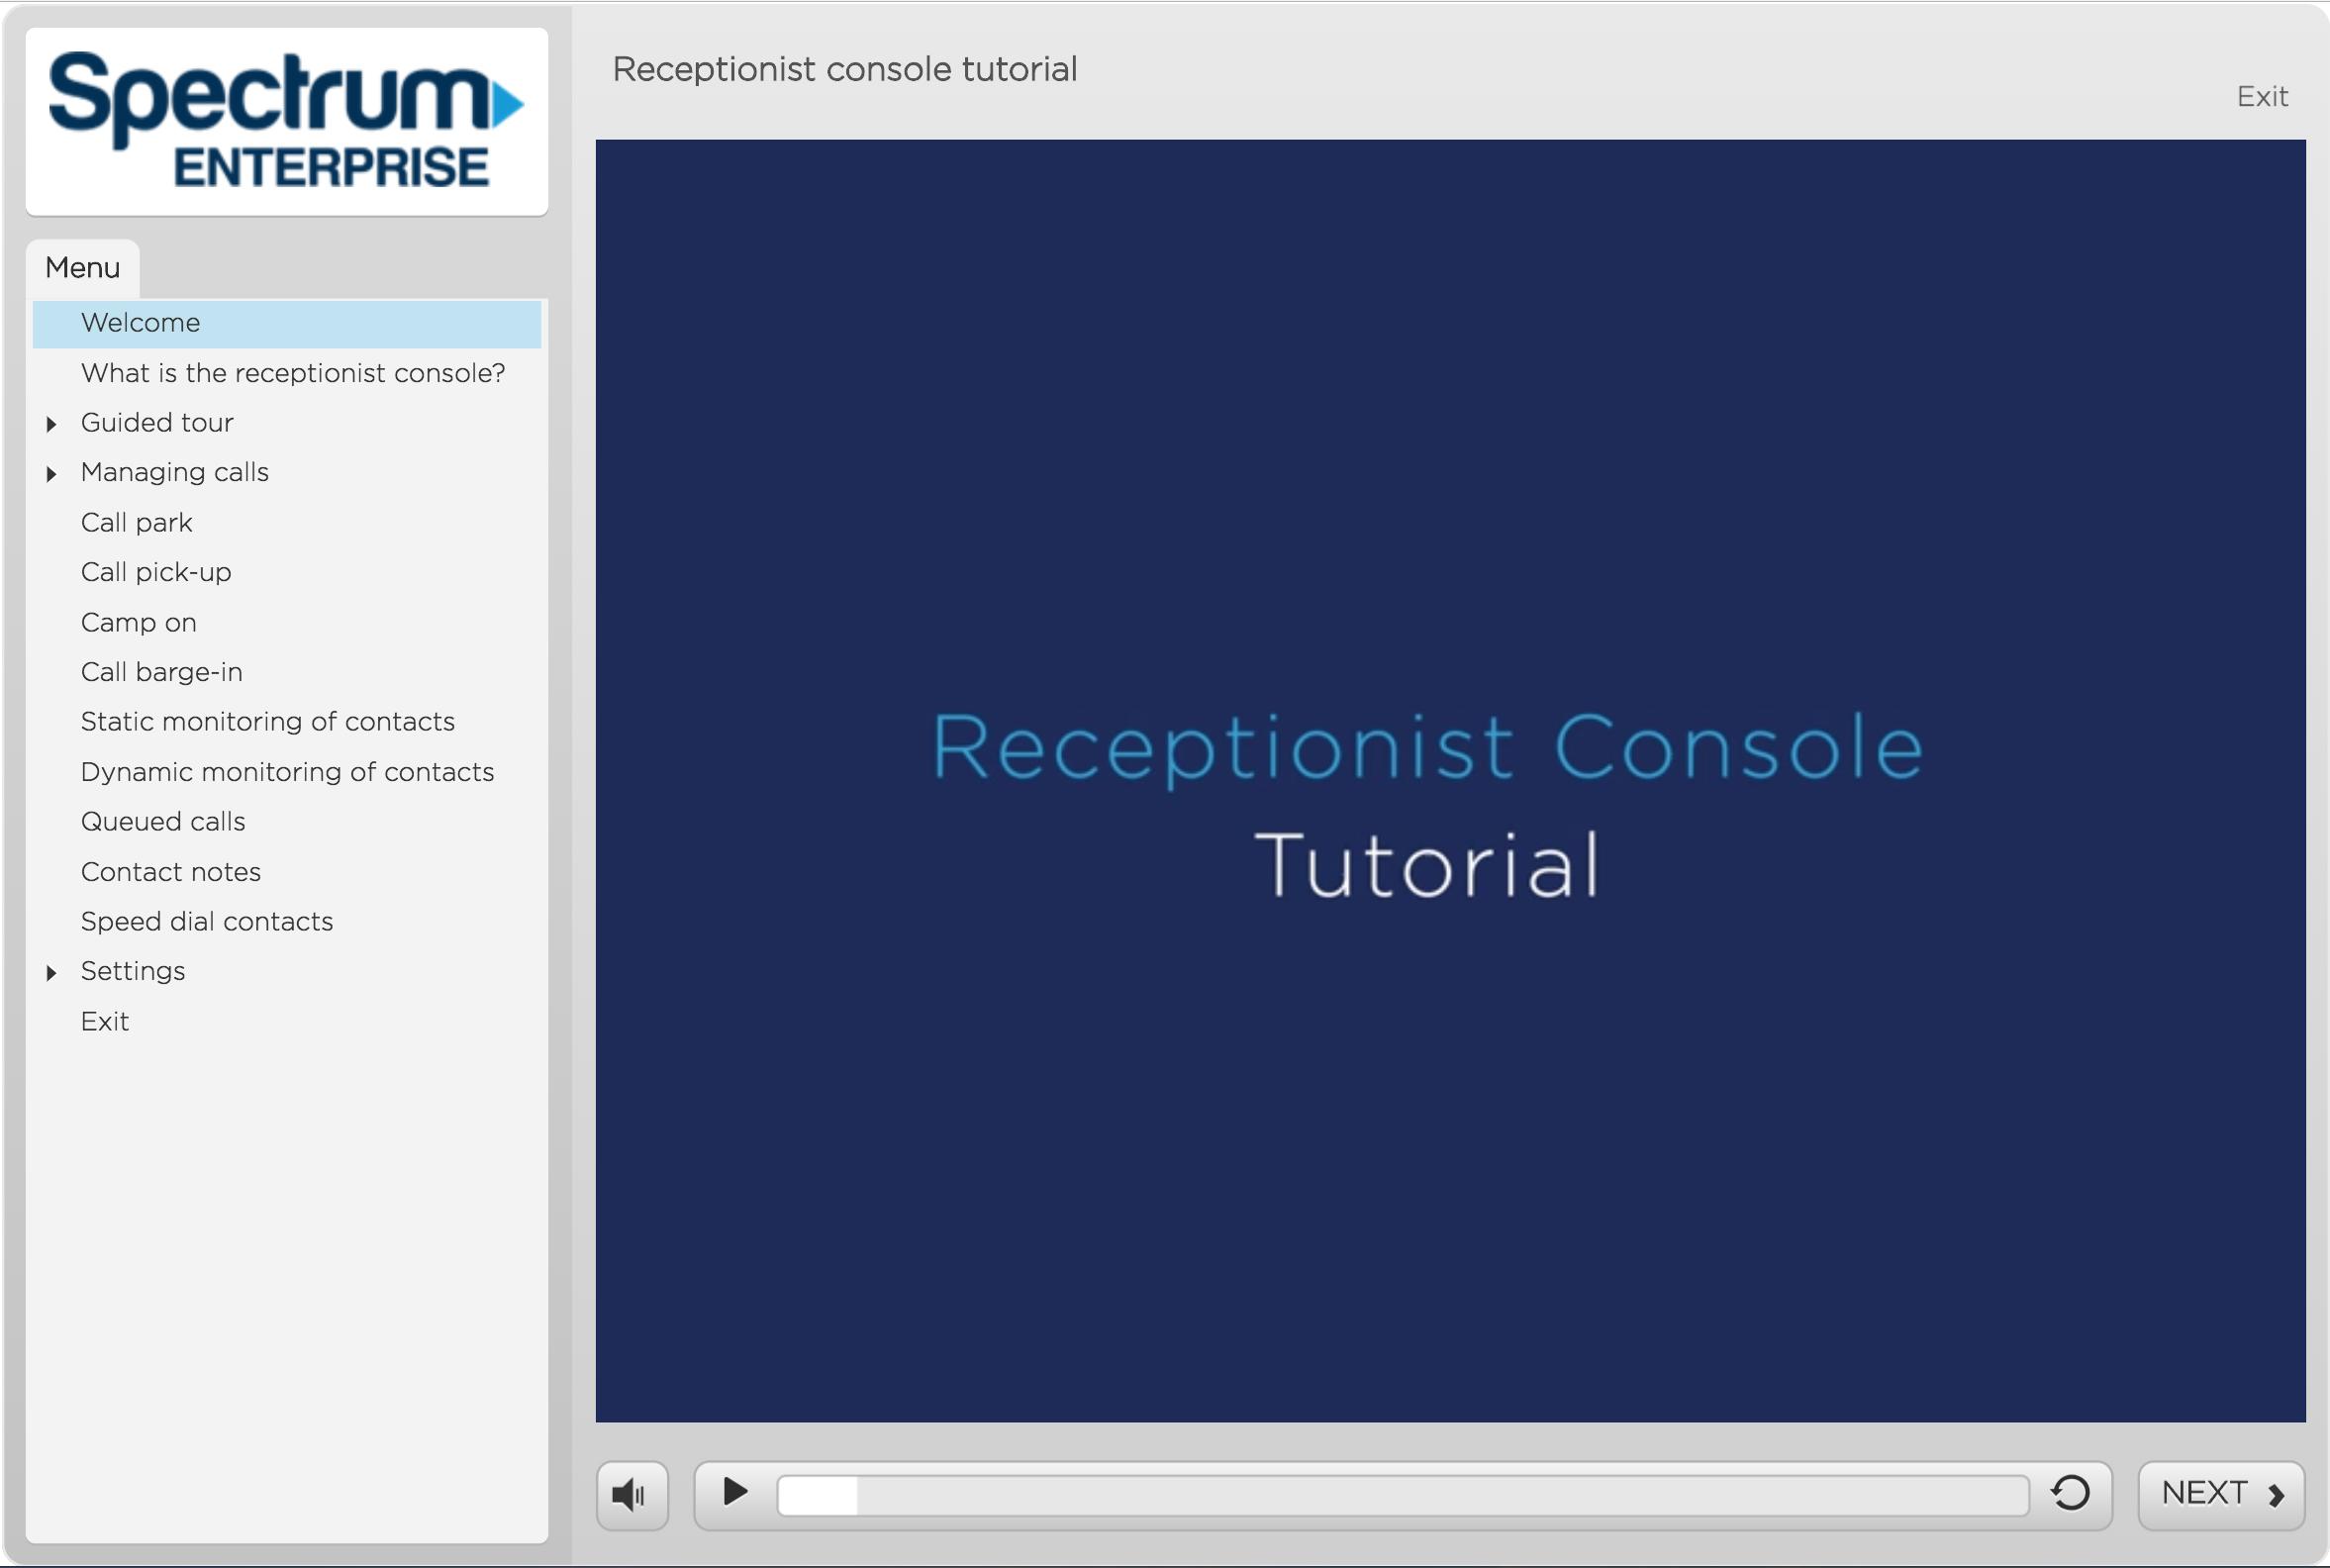 Receptionist console tutorial